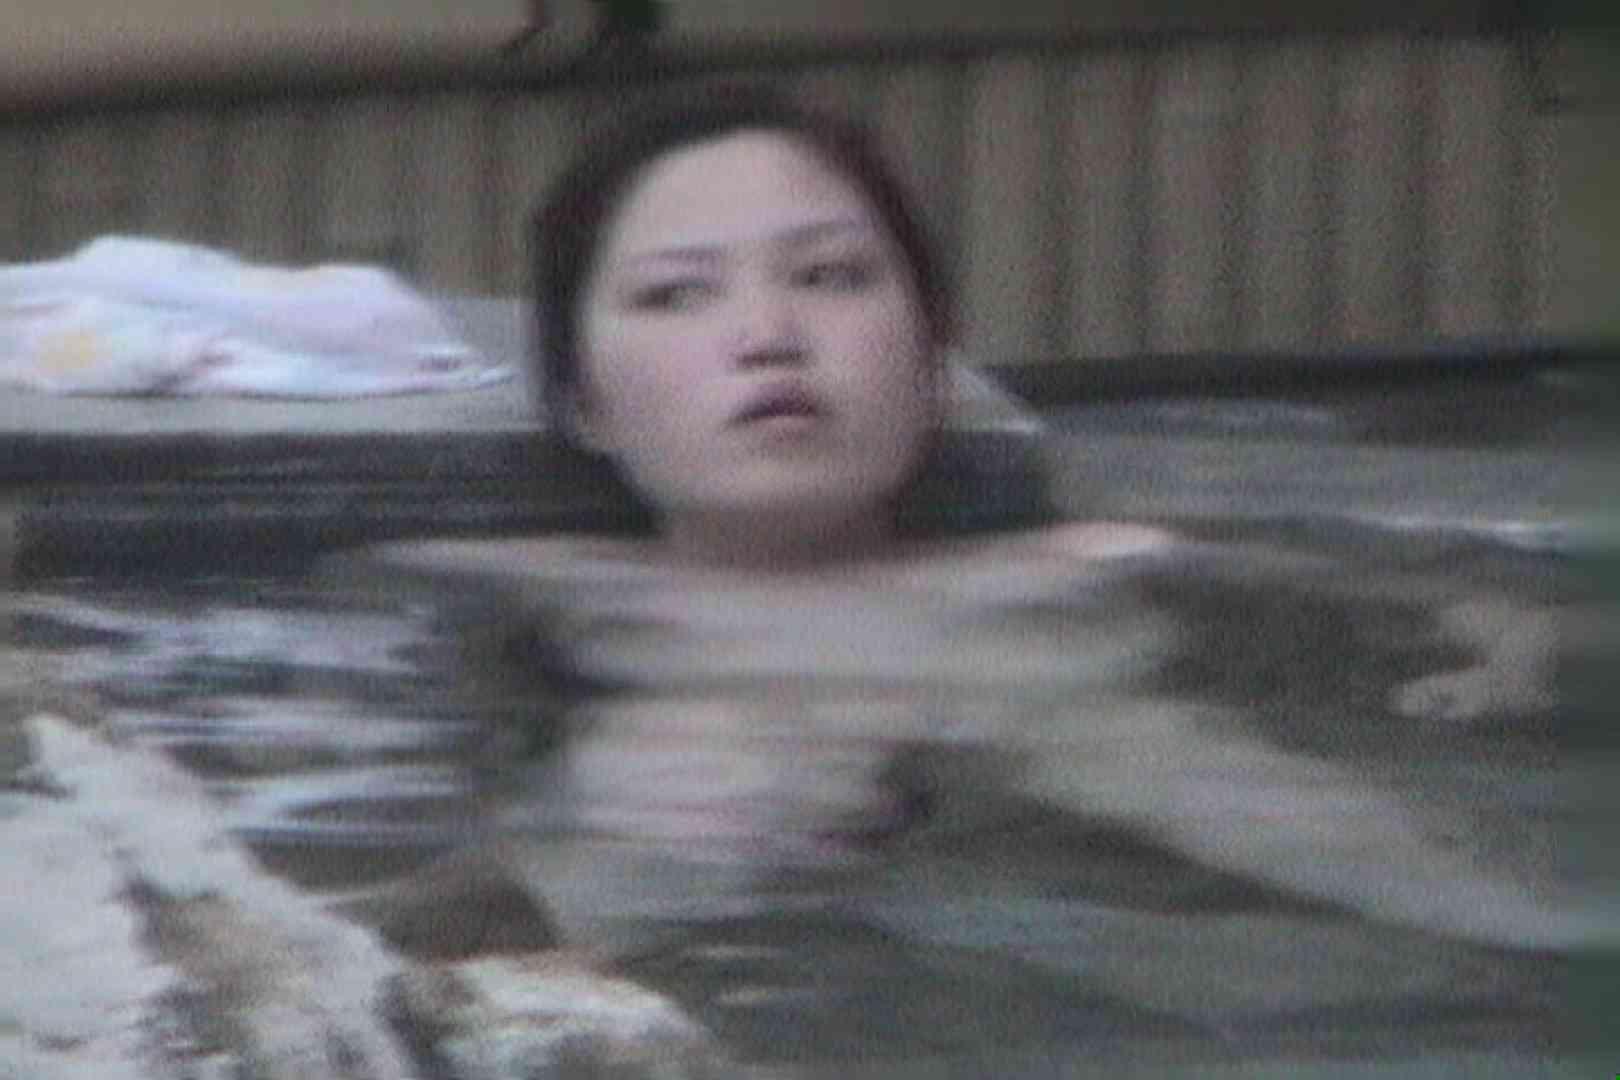 Aquaな露天風呂Vol.602 露天風呂編 | 盗撮シリーズ  83PIX 81